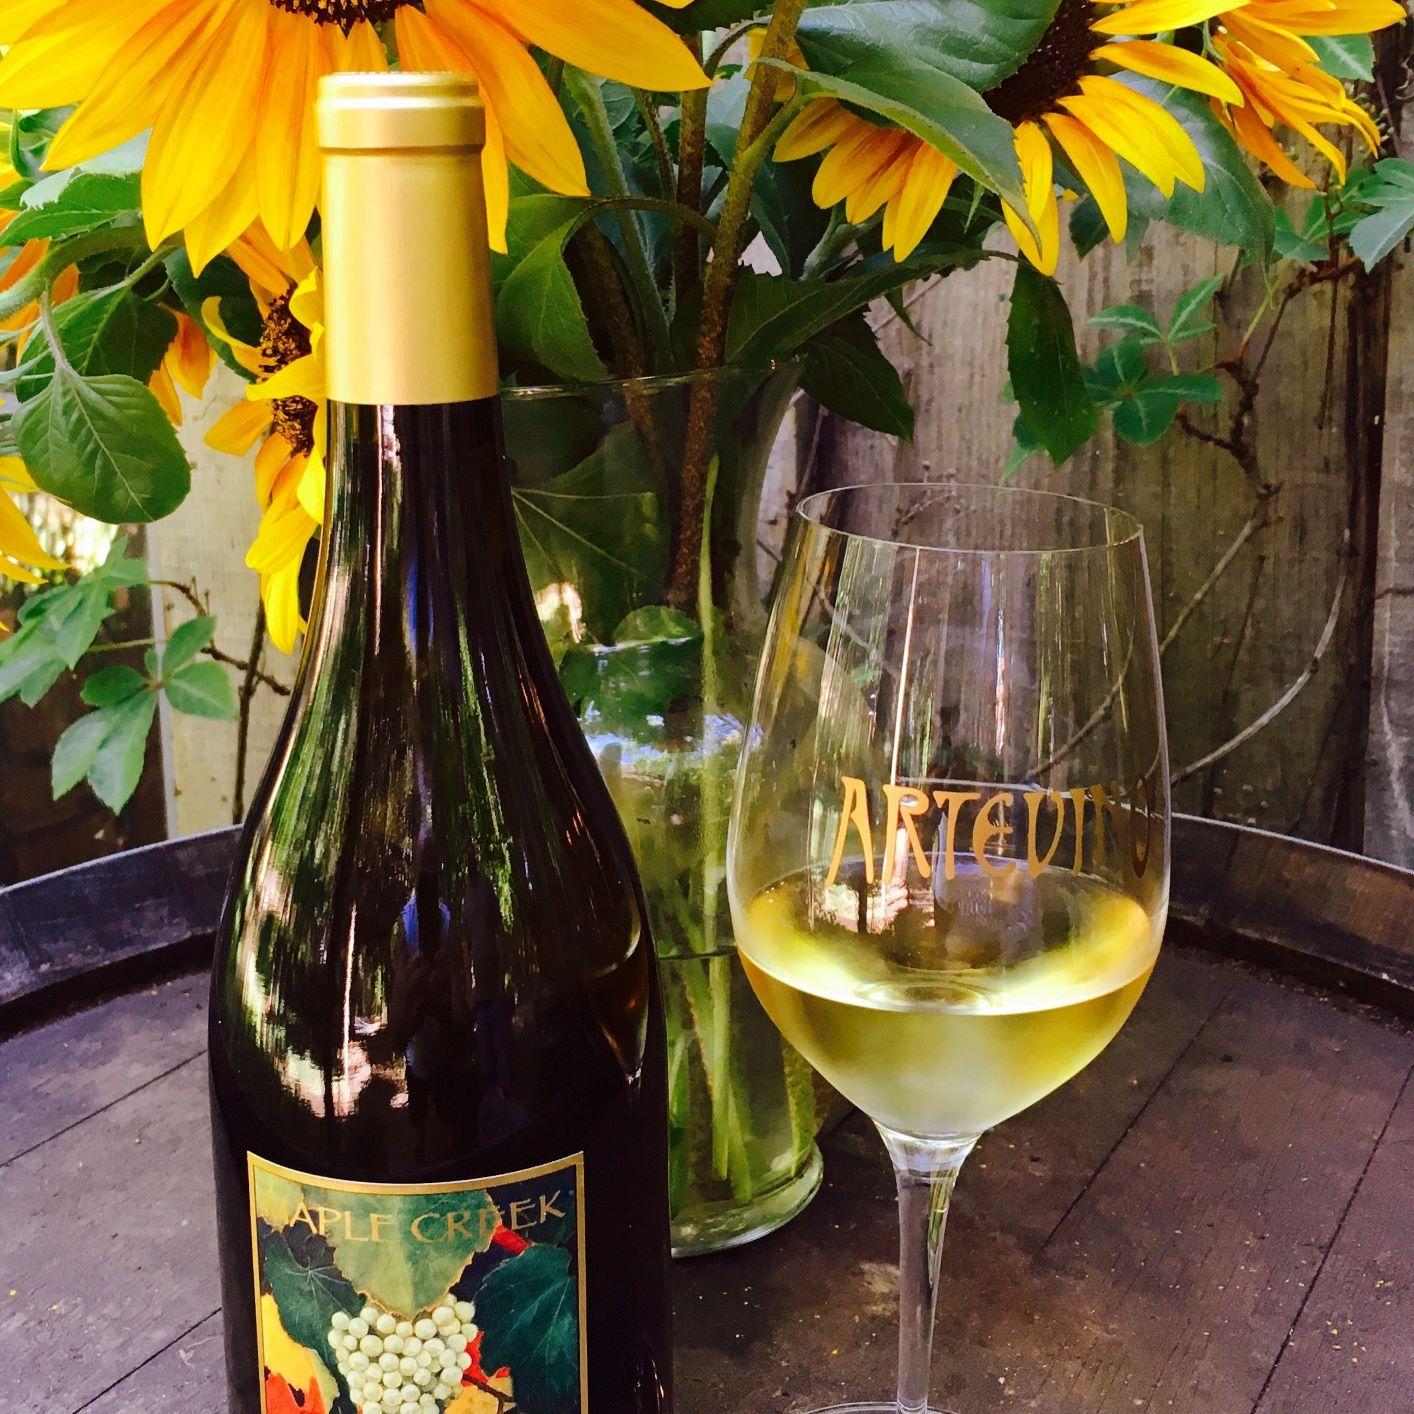 MCW_Wine bottles Spring_small.jpg